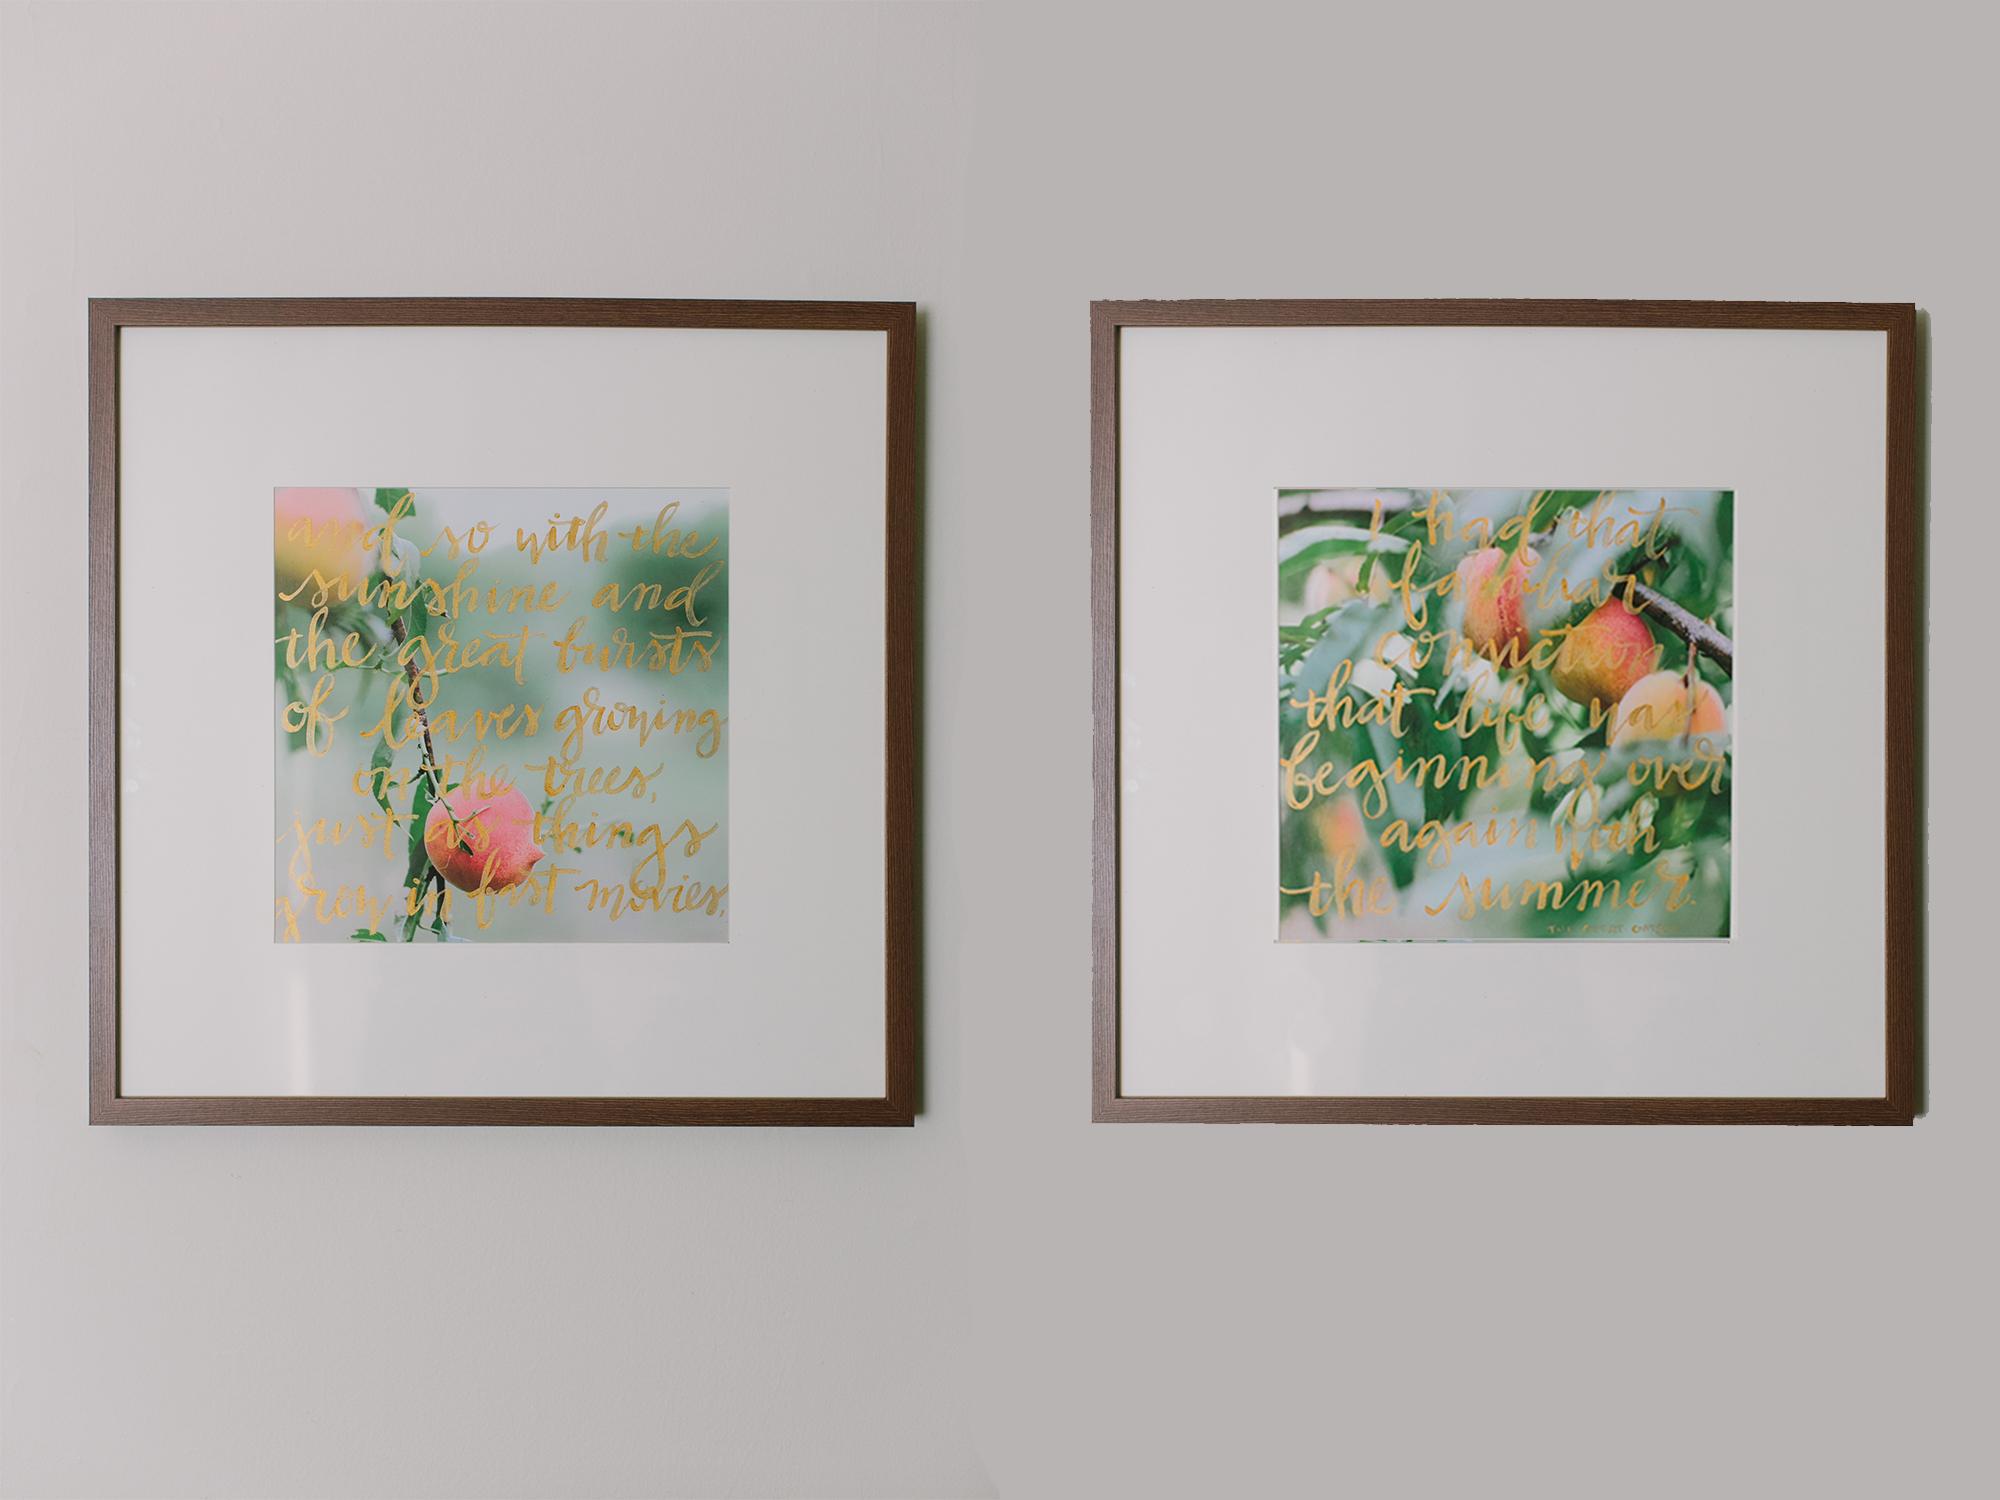 Kathryn-McCrary-Photography-Jenn-Gietzen-Write-On-Designs-Market-Collab-Peaches-119.jpg